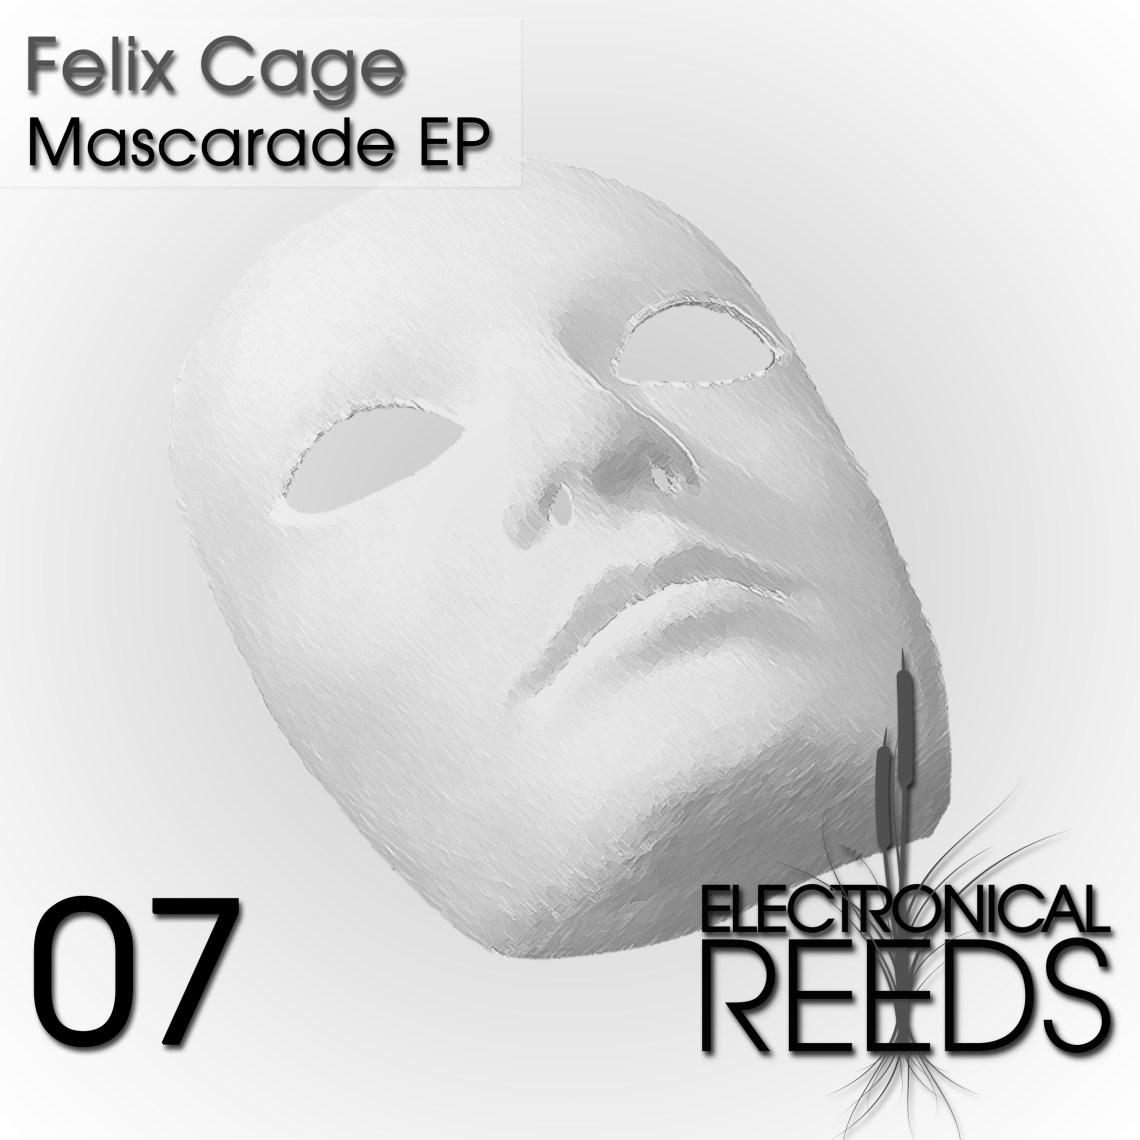 ER007 - Felix Cage - Mascarade EP (incl. Rodirgueez Jr & Nhar Remix) - Electronical Reeds